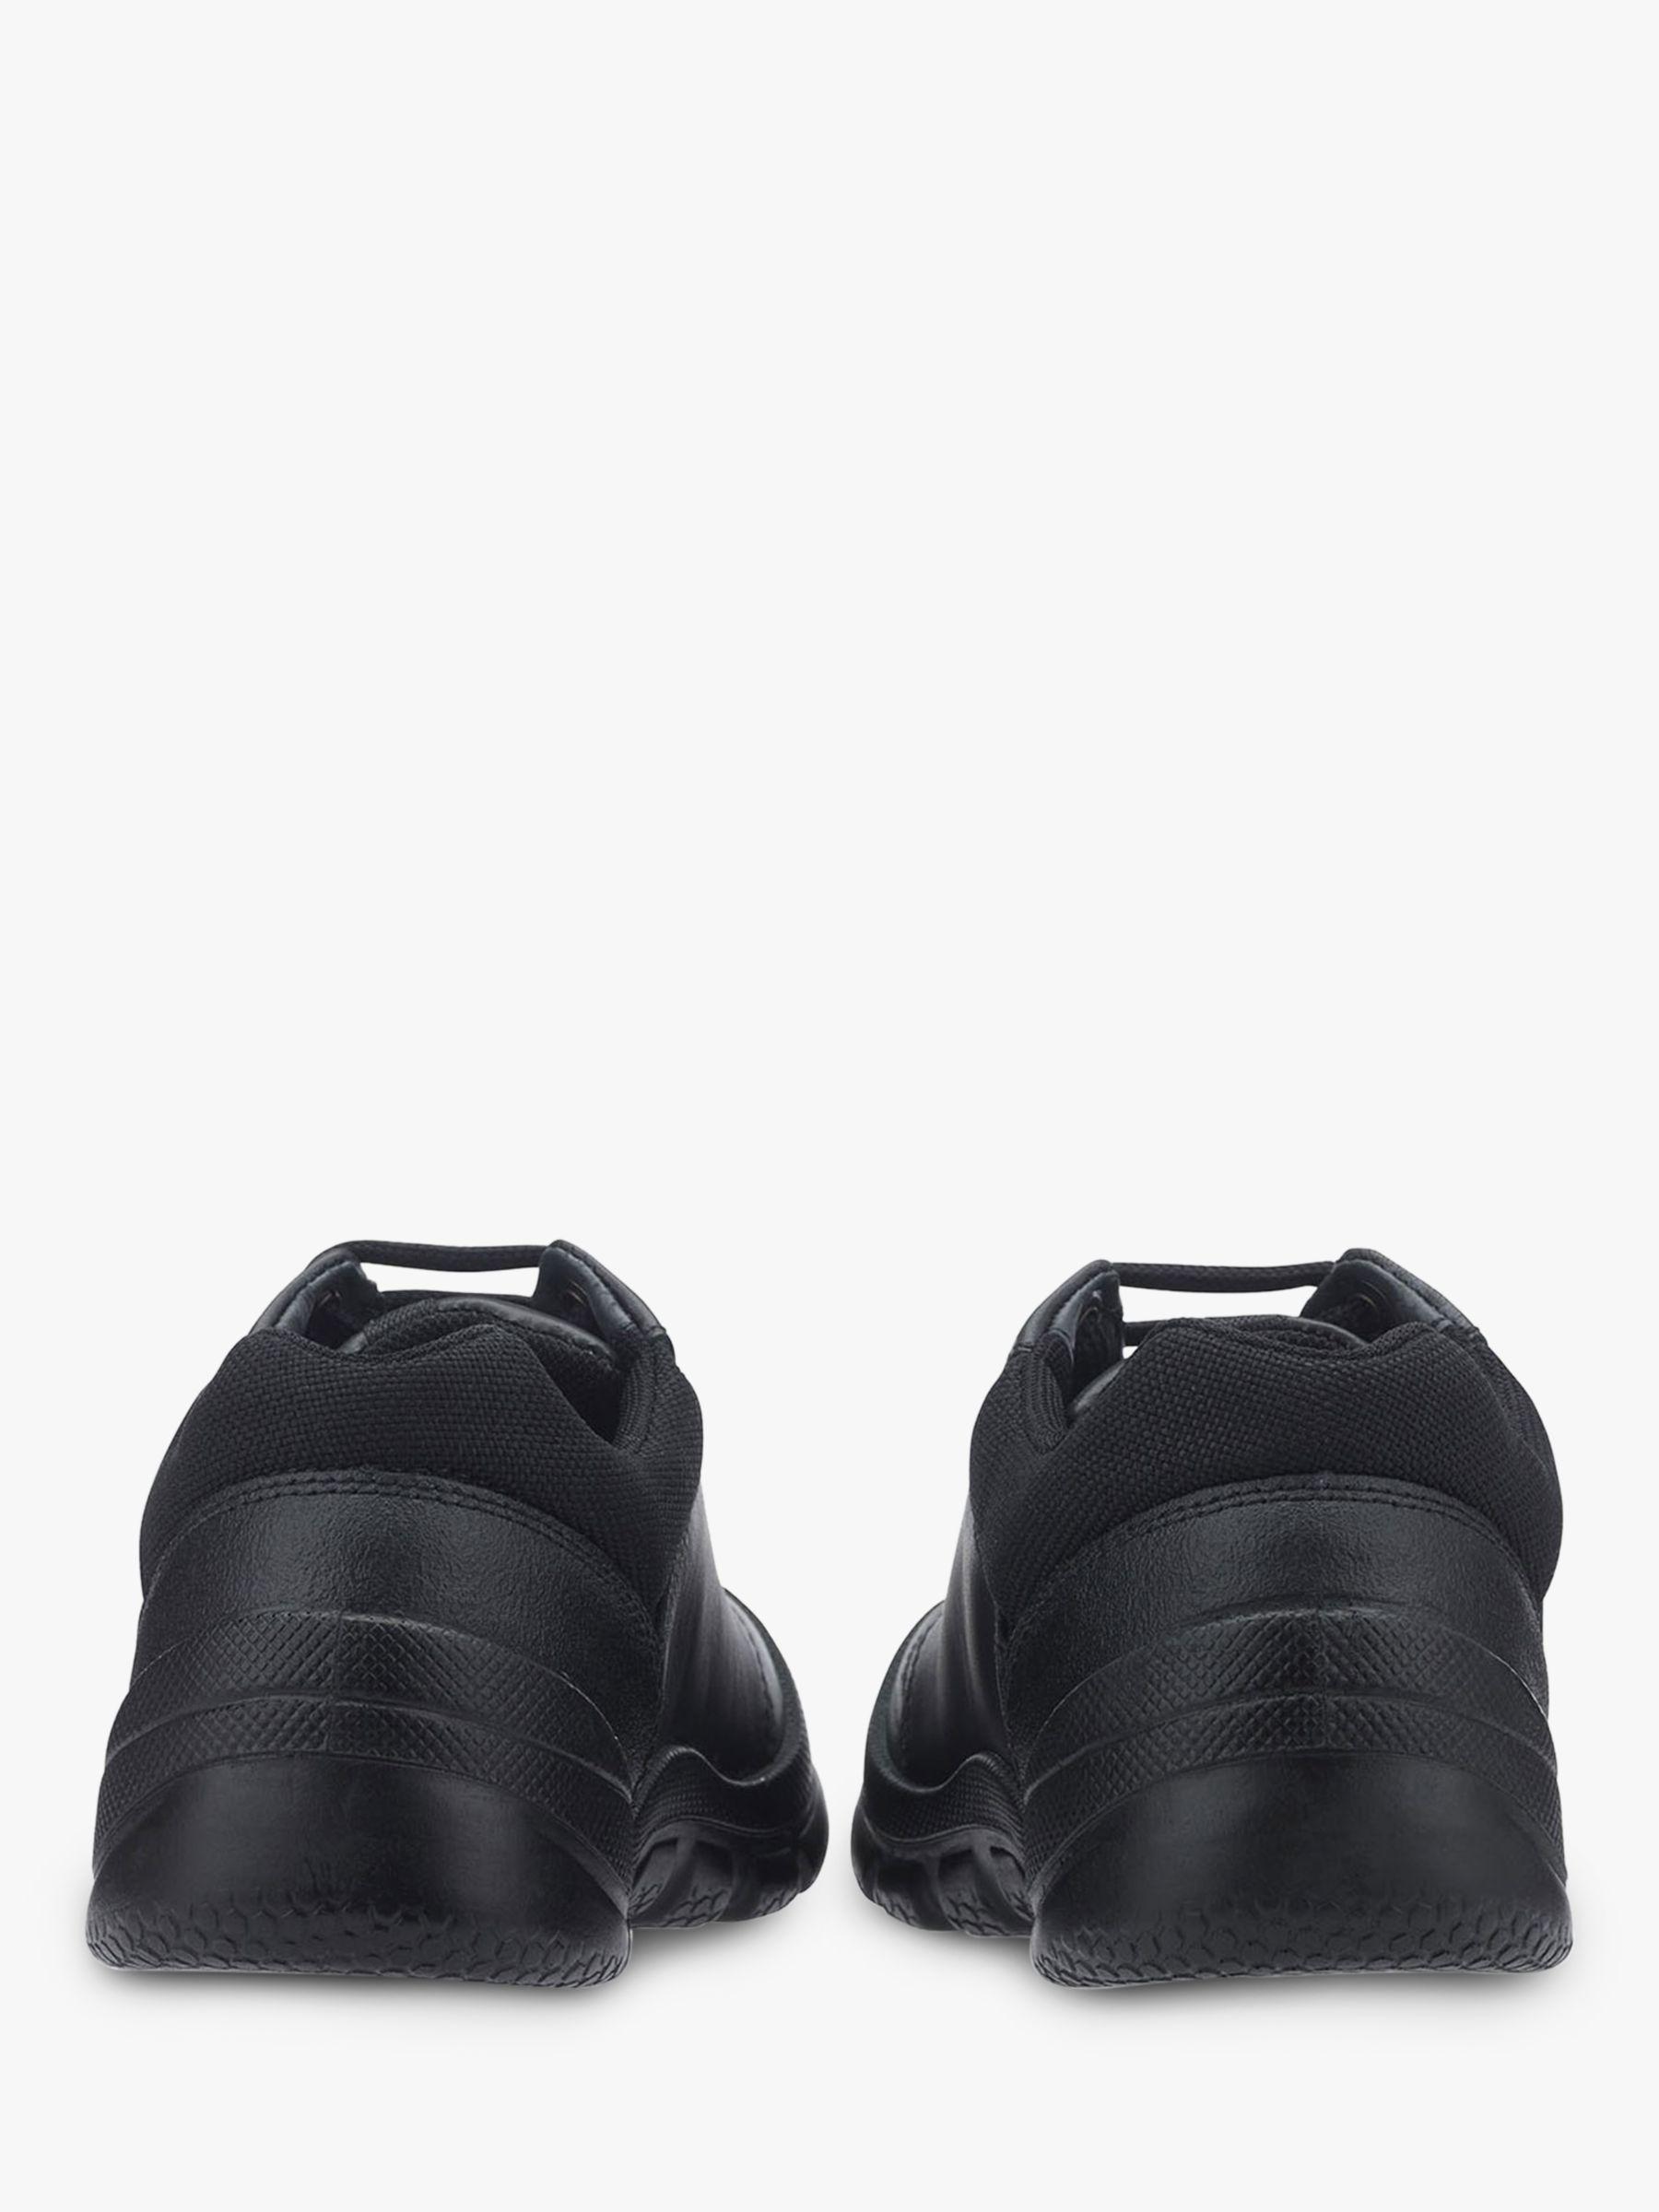 Start-Rite Start-rite Children's Rhino Sherman Shoes, Black